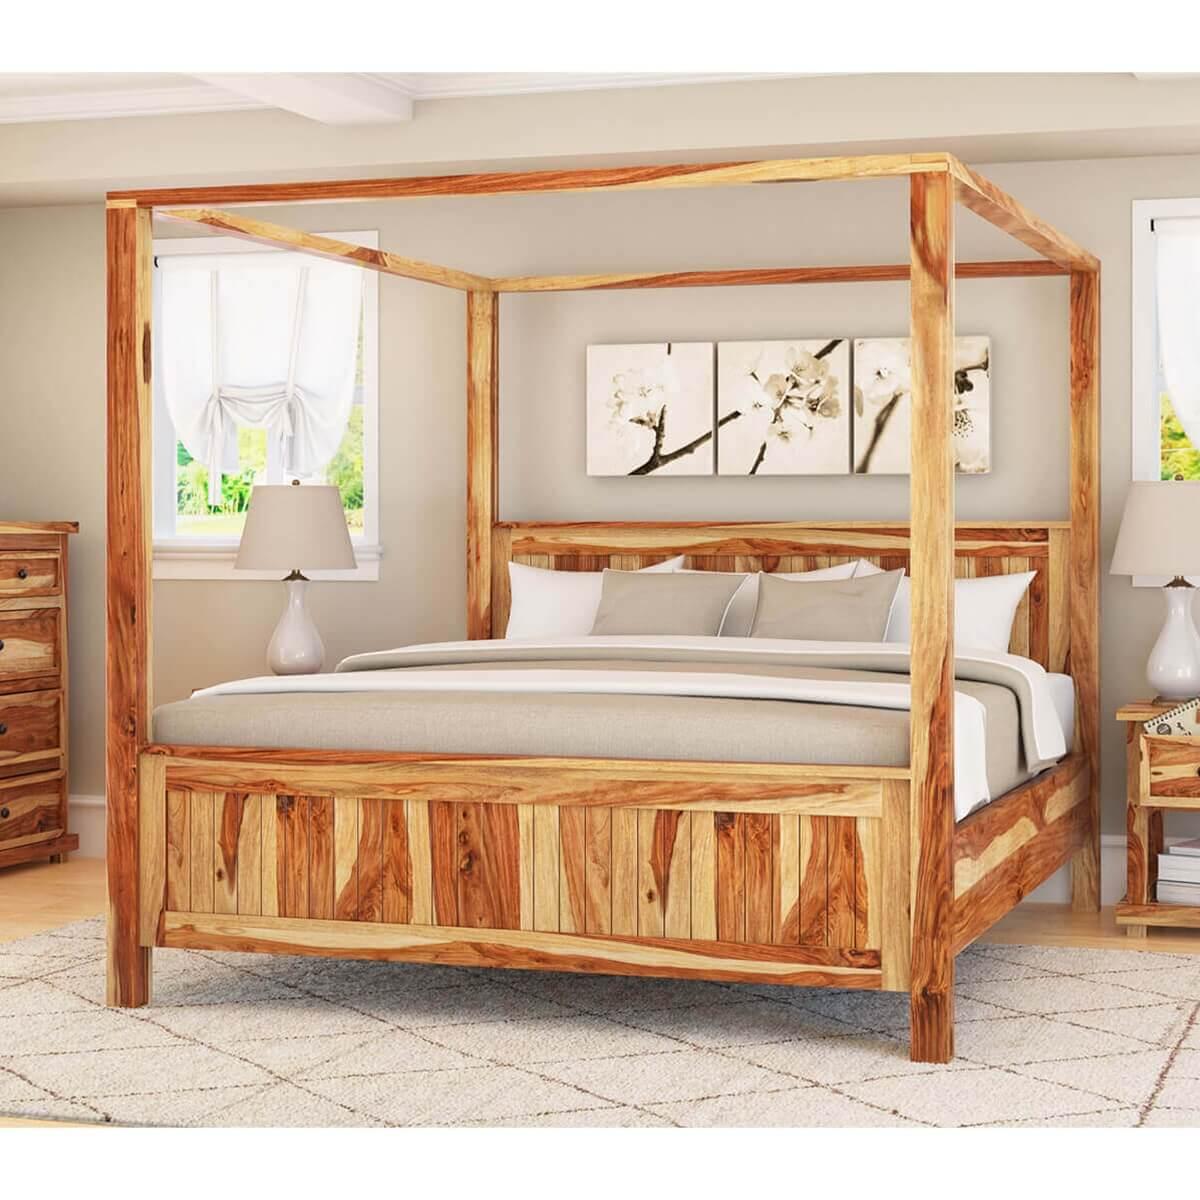 - Larvik Rustic Solid Wood Platform Canopy Bed